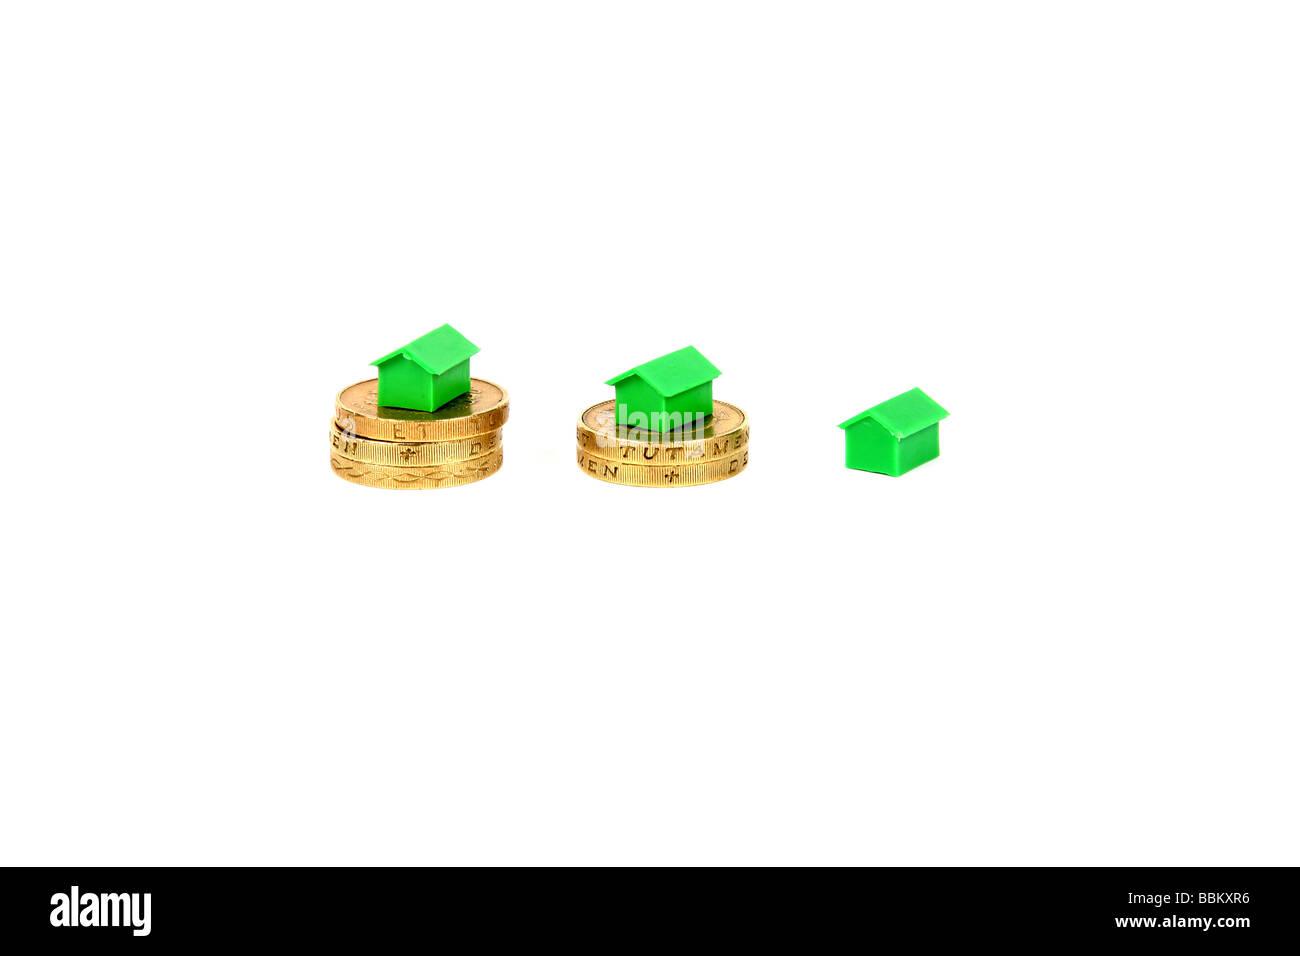 Money market home value concept photo - Stock Image